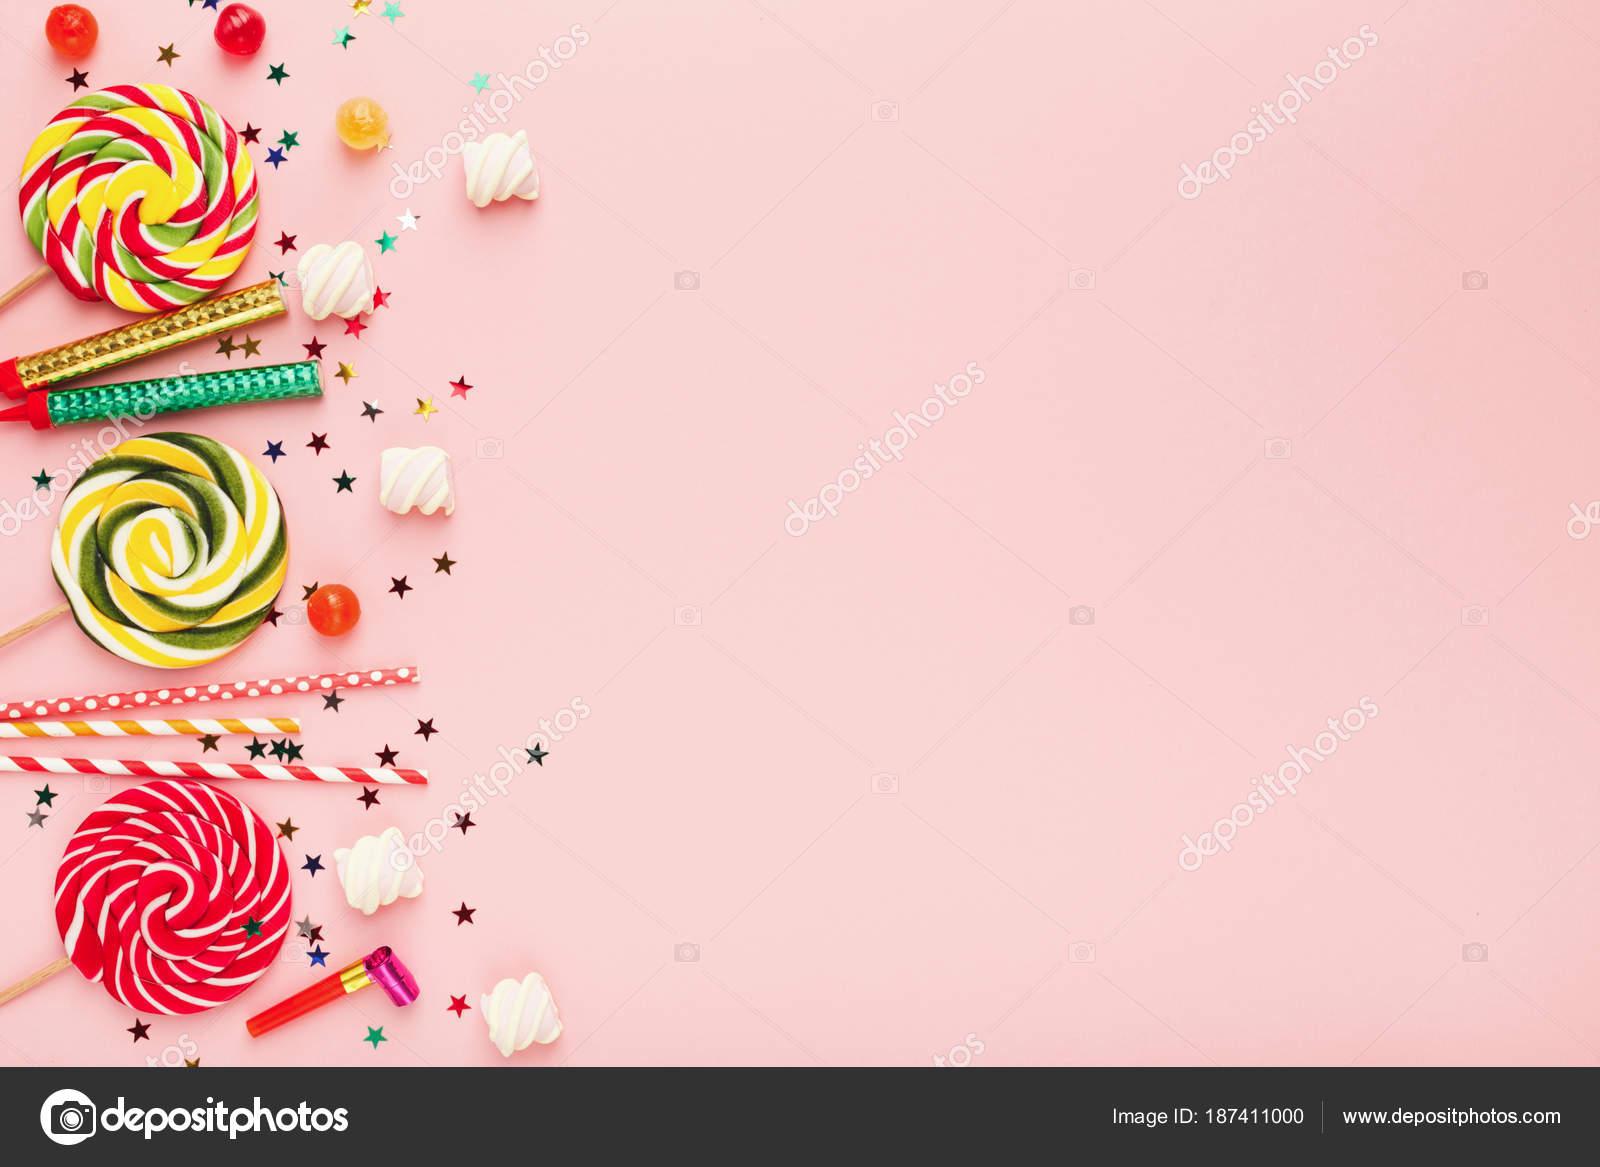 children birthday party background stock photo milkos 187411000